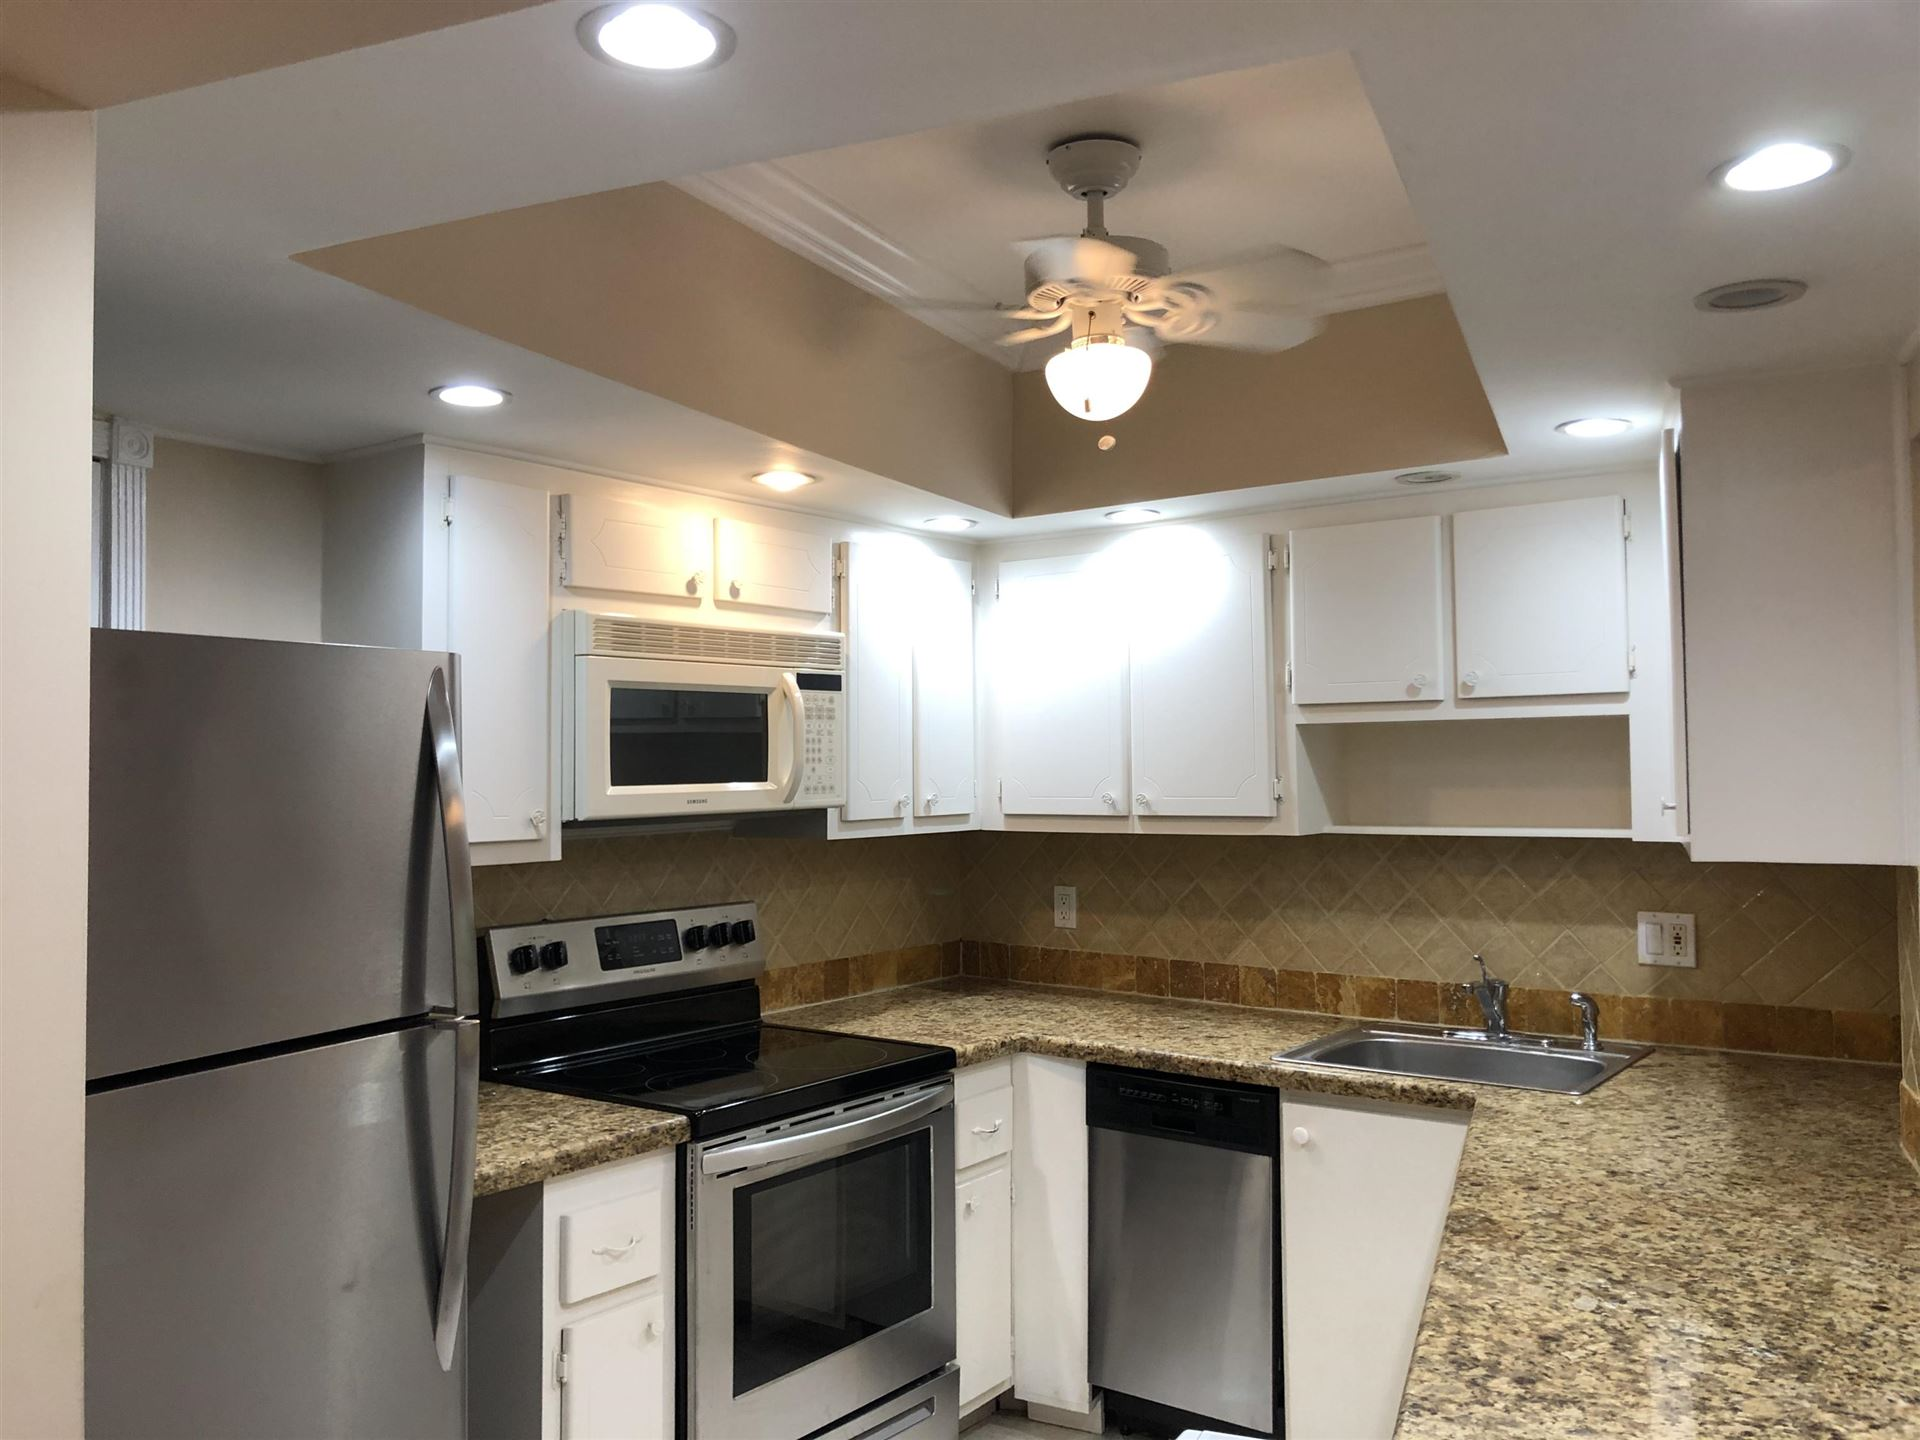 5501 NW 2nd Avenue #310, Boca Raton, FL 33487 - MLS#: RX-10665507